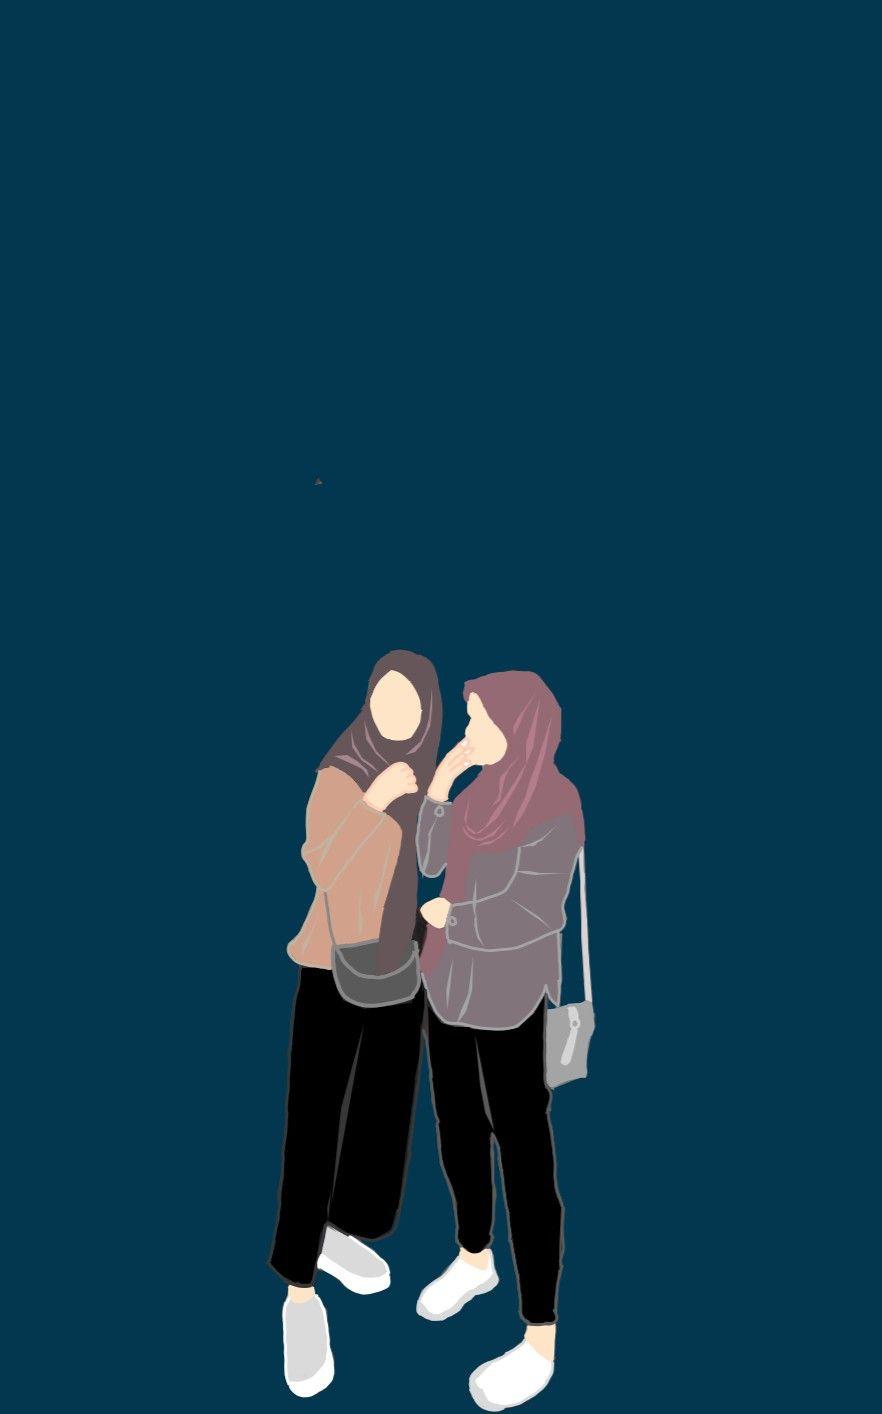 Styleseventeen Ilustrasi Gadis Kartun Hijab Gambar Bff